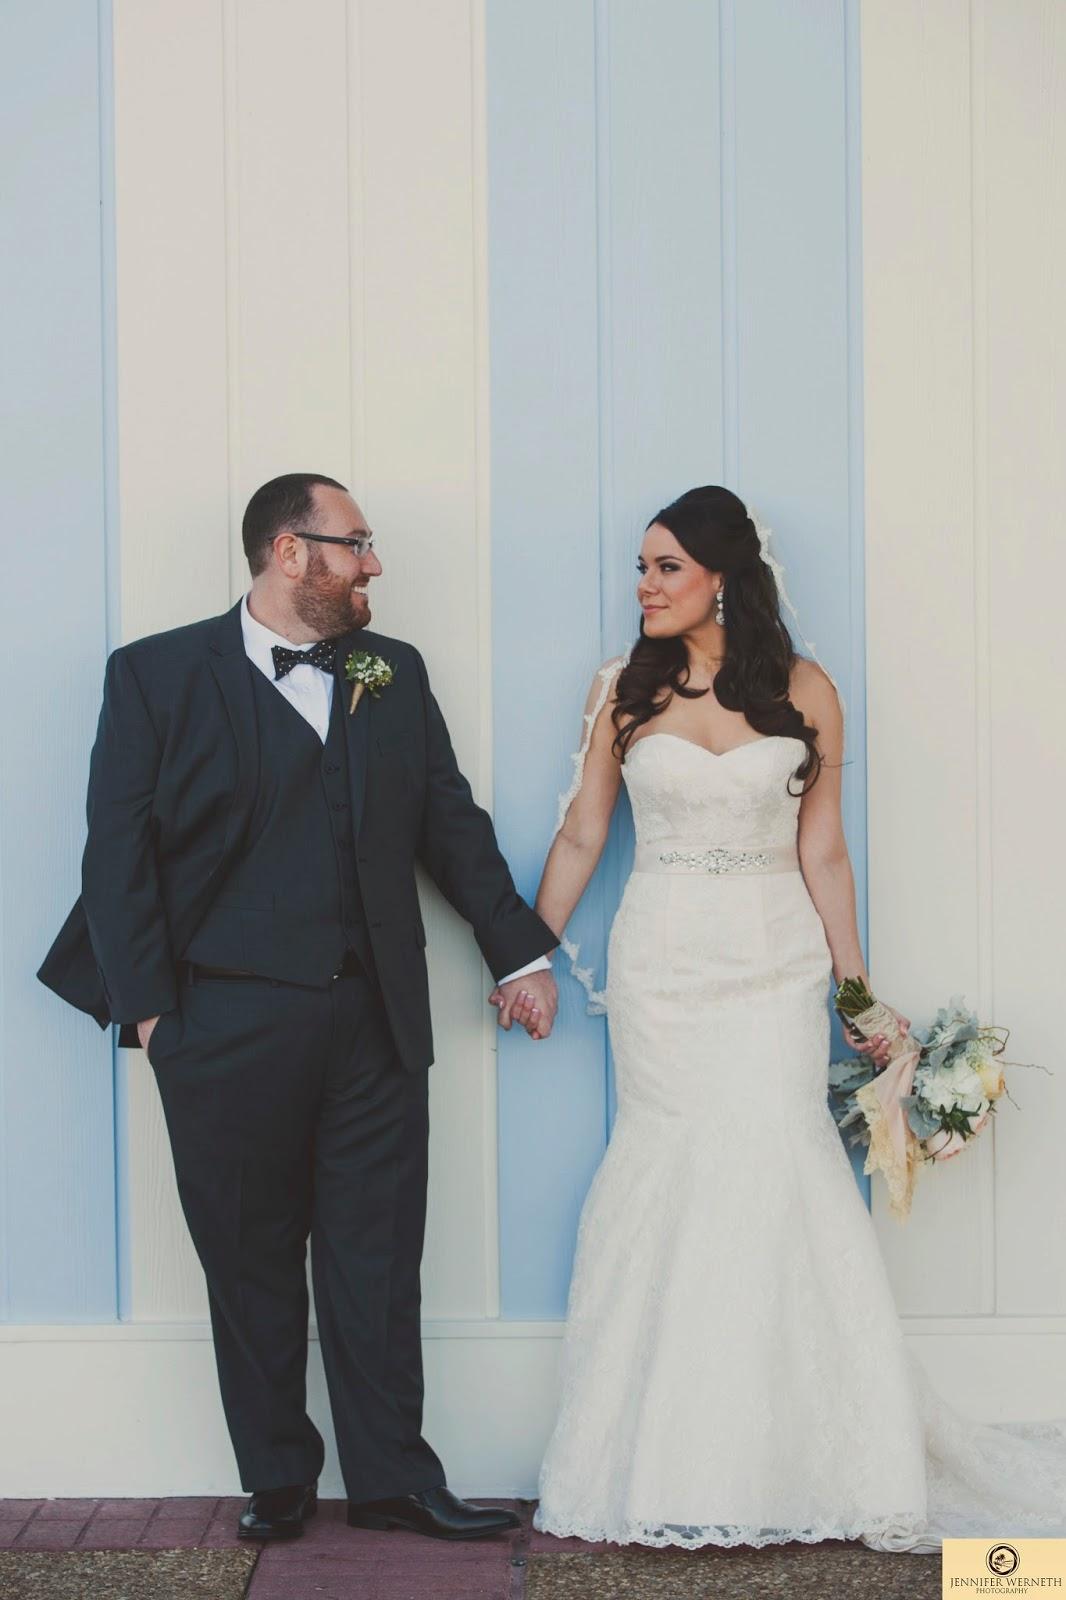 Honolulu, Oahu, Hawaii family Photographers, wedding photography